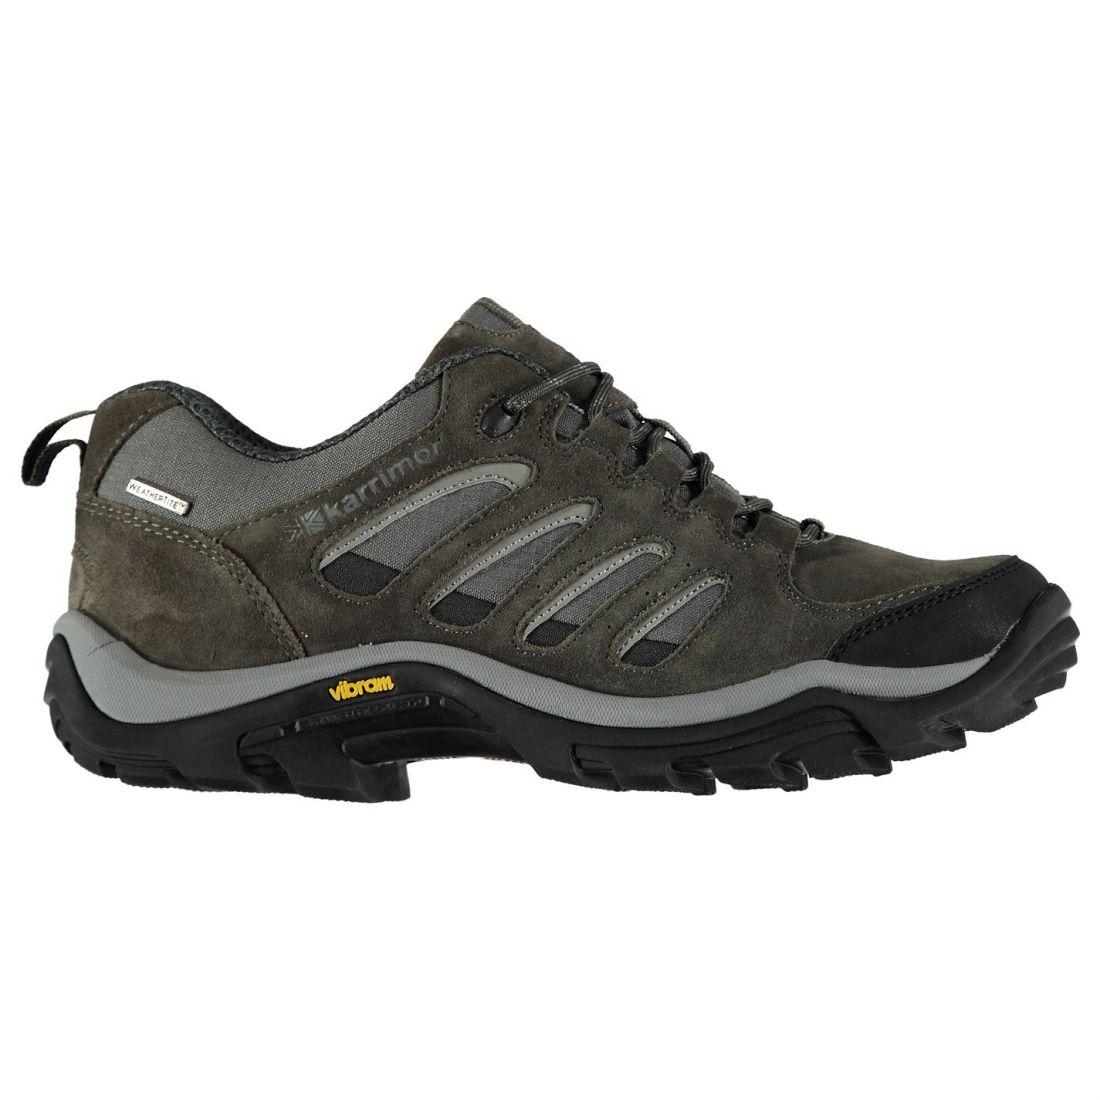 Karrimor Aspen Low Waterproof Suede Upper Hiking Walking shoes Lace Up Mens